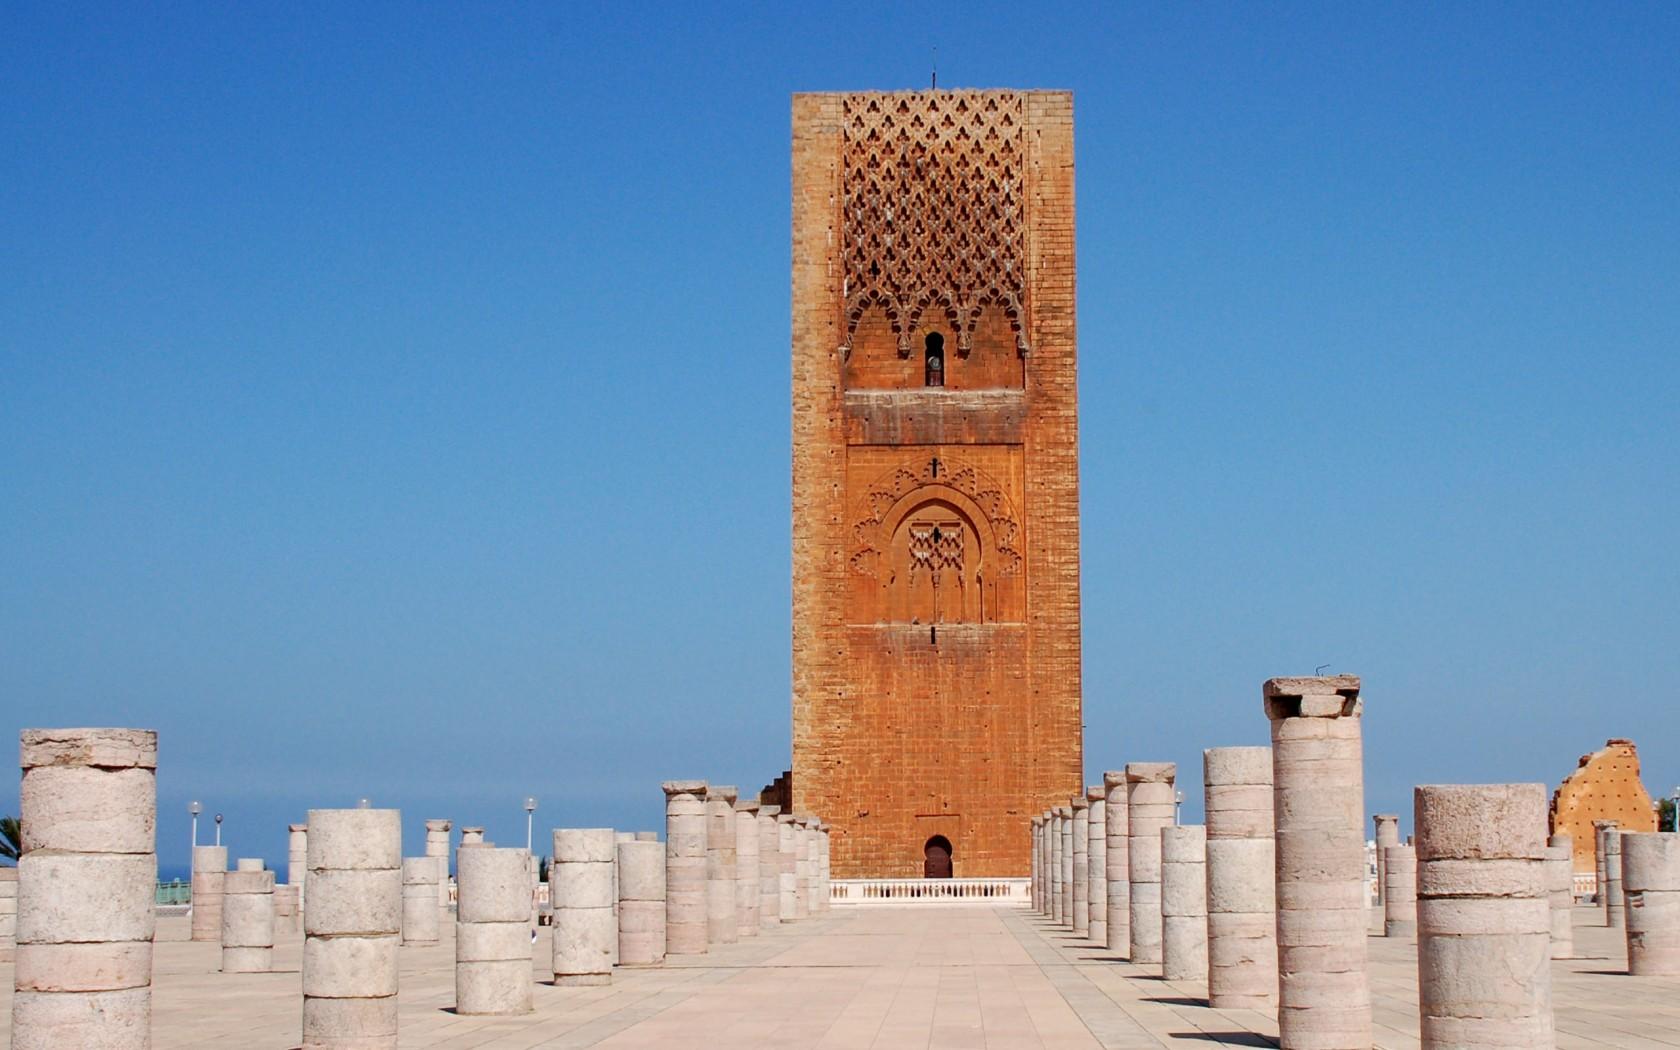 http://www.budavartours.hu/binaries//content/gallery/budavar/programs/programscheme/Marokk%C3%B3/Agadir/marokko-gazdagon-argana-hotel/hassan-tower-rabat-morocco-03-1050x1680.jpg